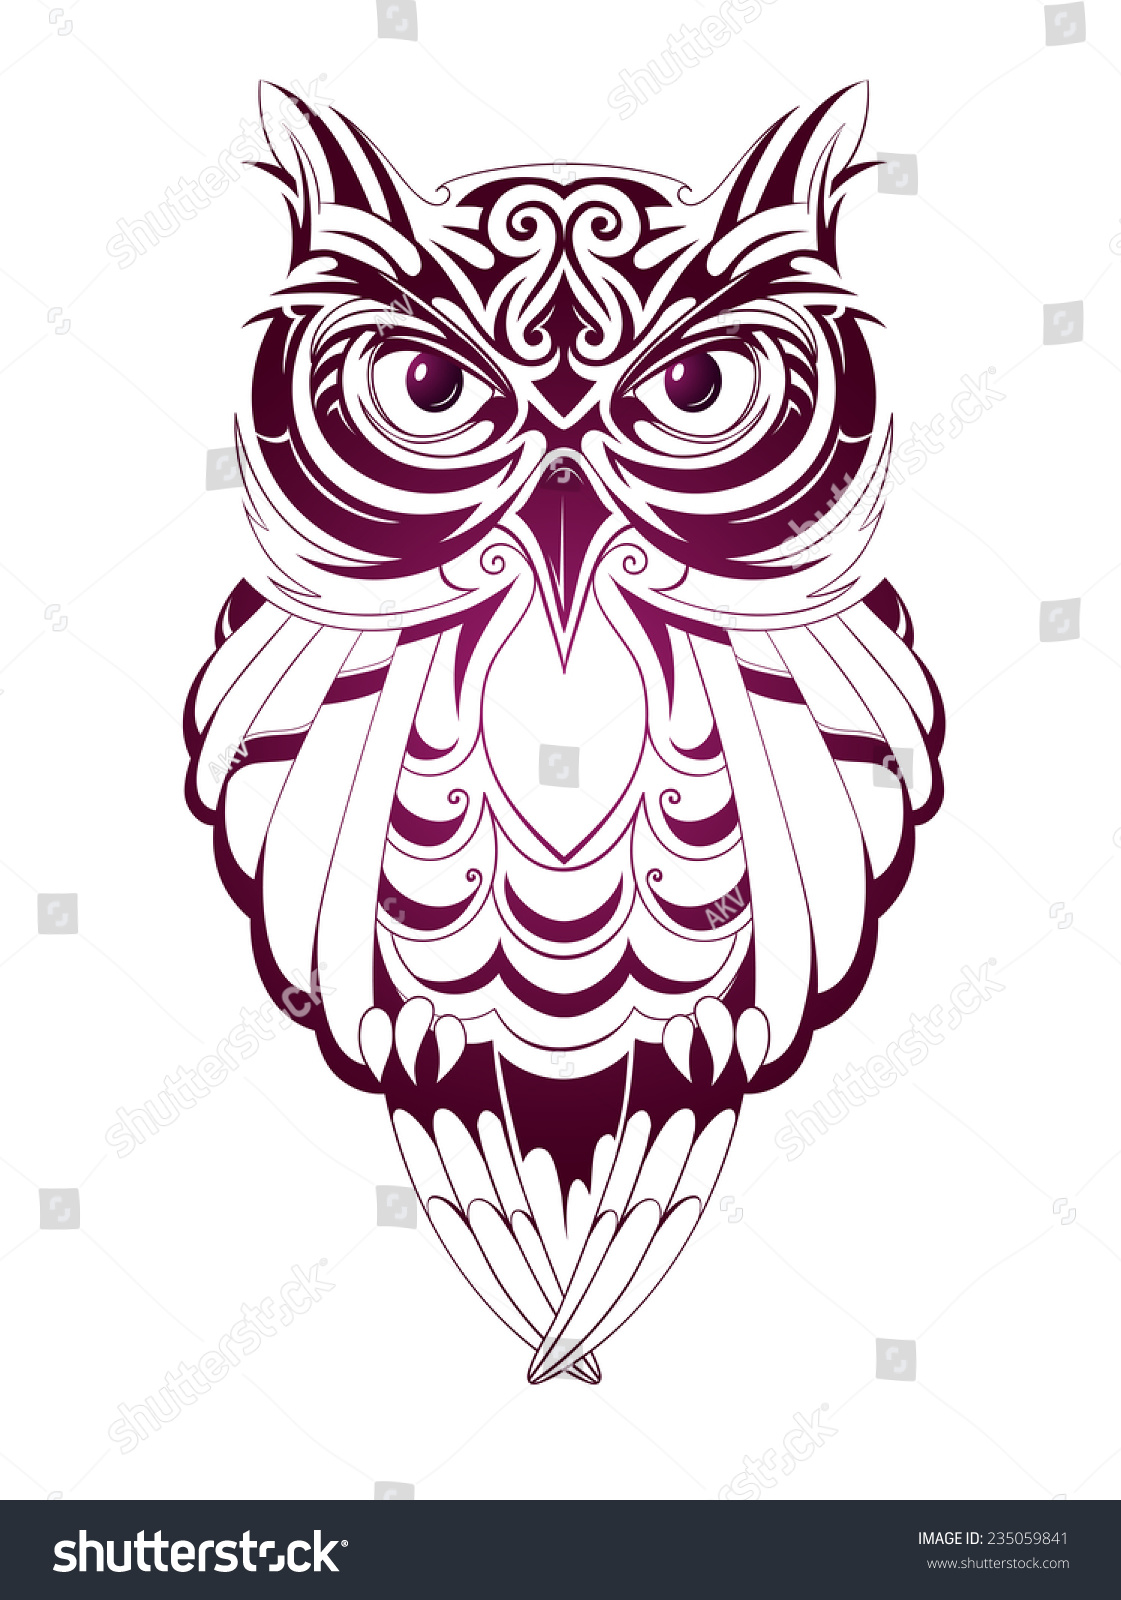 Owl Tattoo Stock Vector 235059841 - Shutterstock